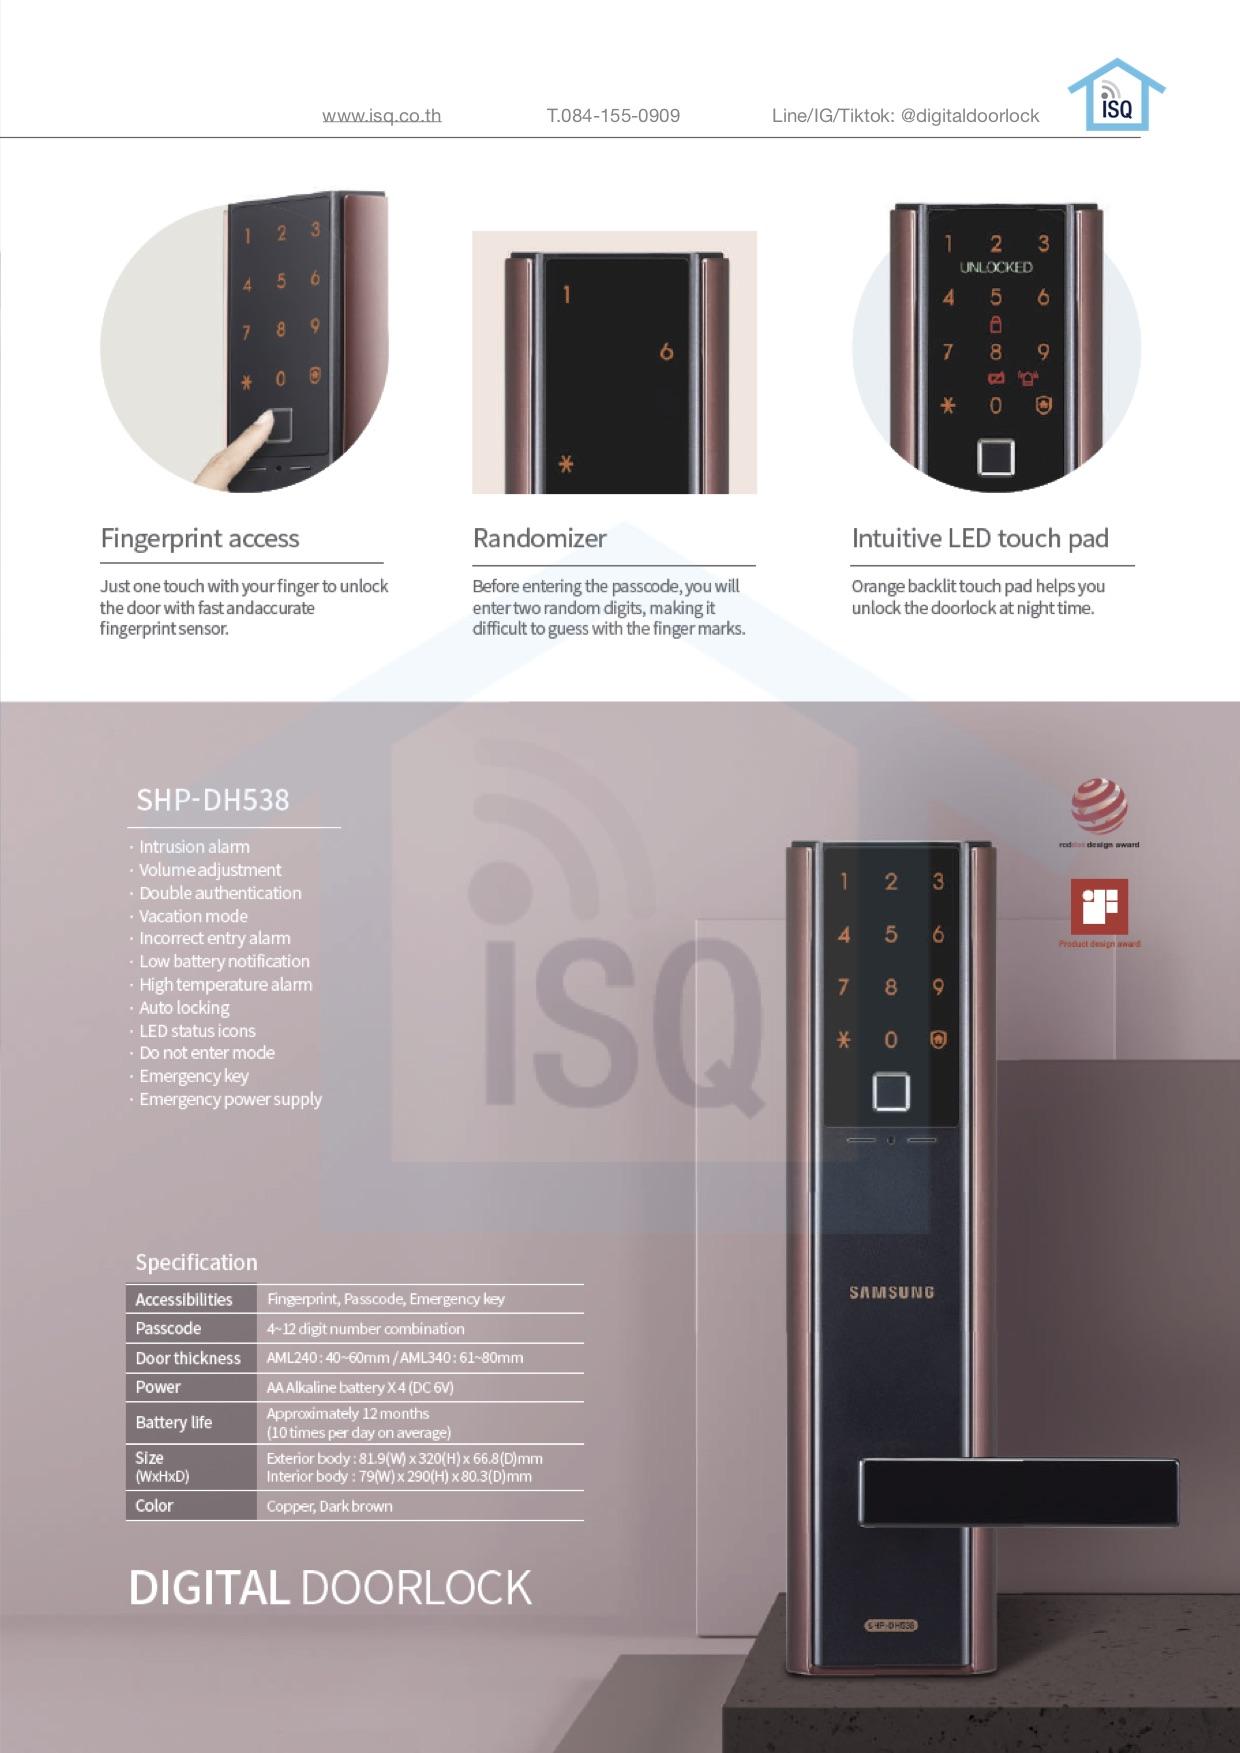 Samsung smart digital door lock SHP-DH538